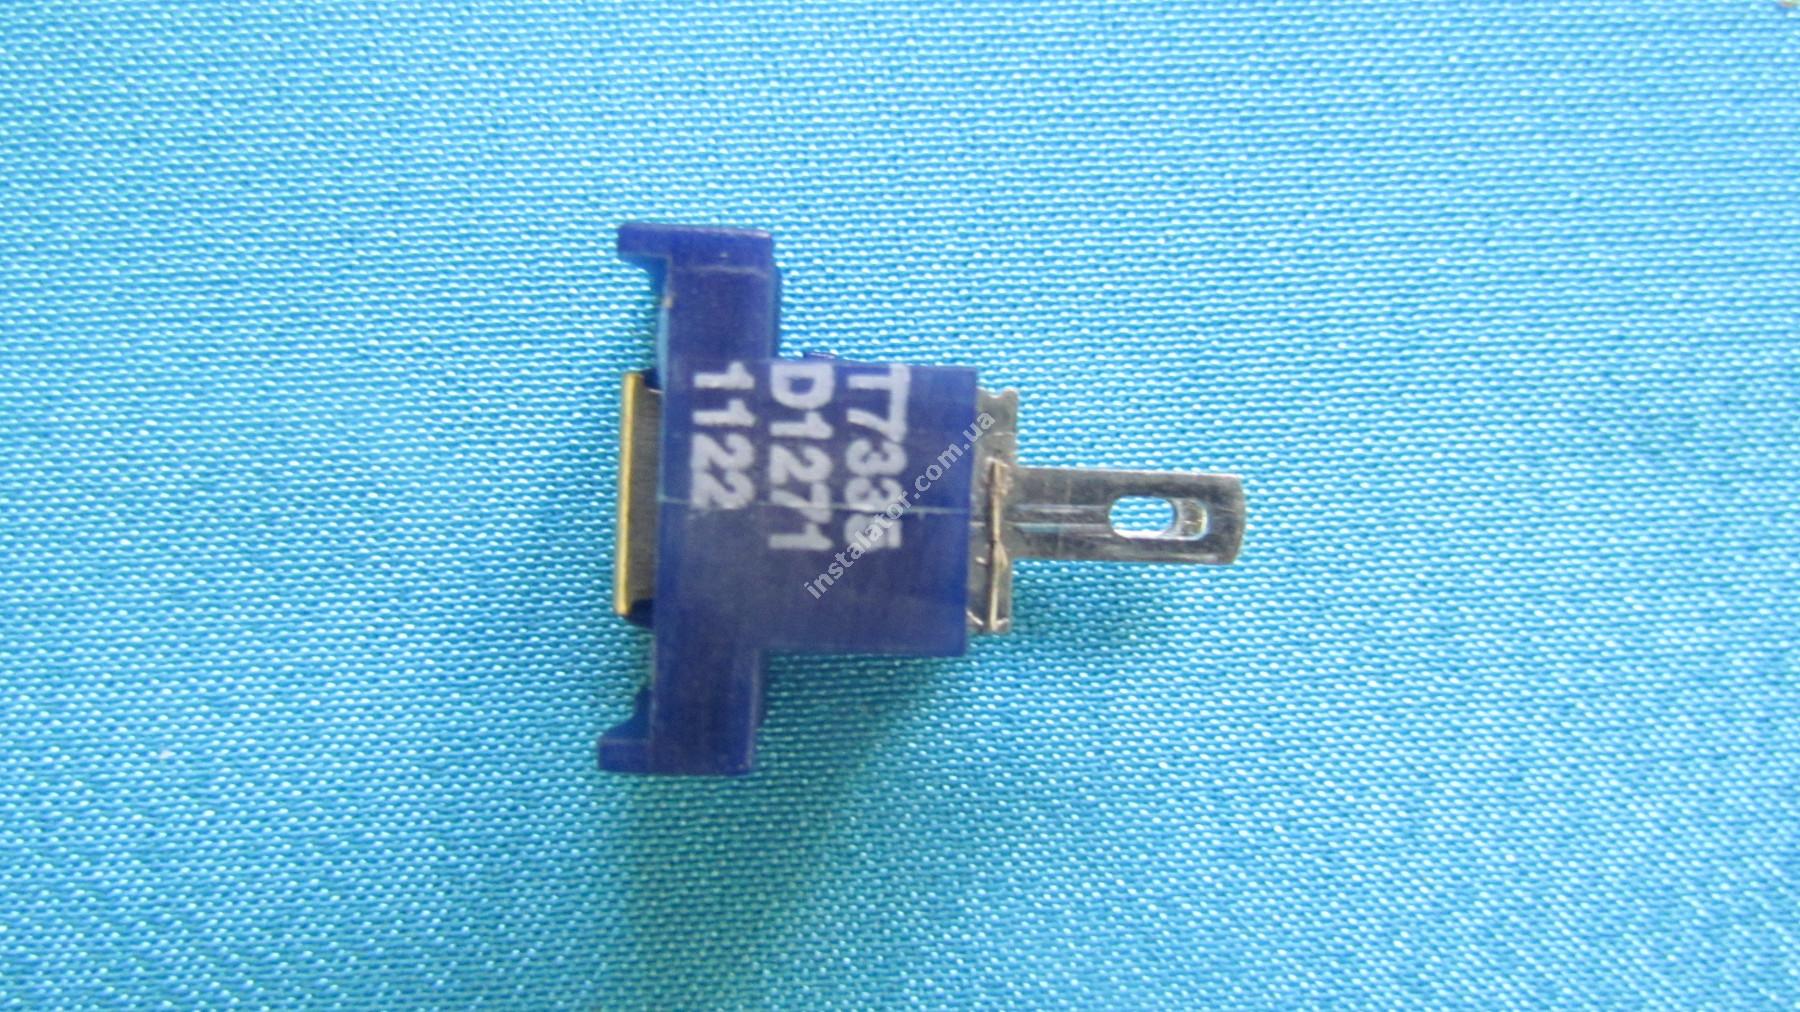 990405 Датчик температури (зонд NTC) накладний синій T7335 ARISTON UNO / ACO full-image-1